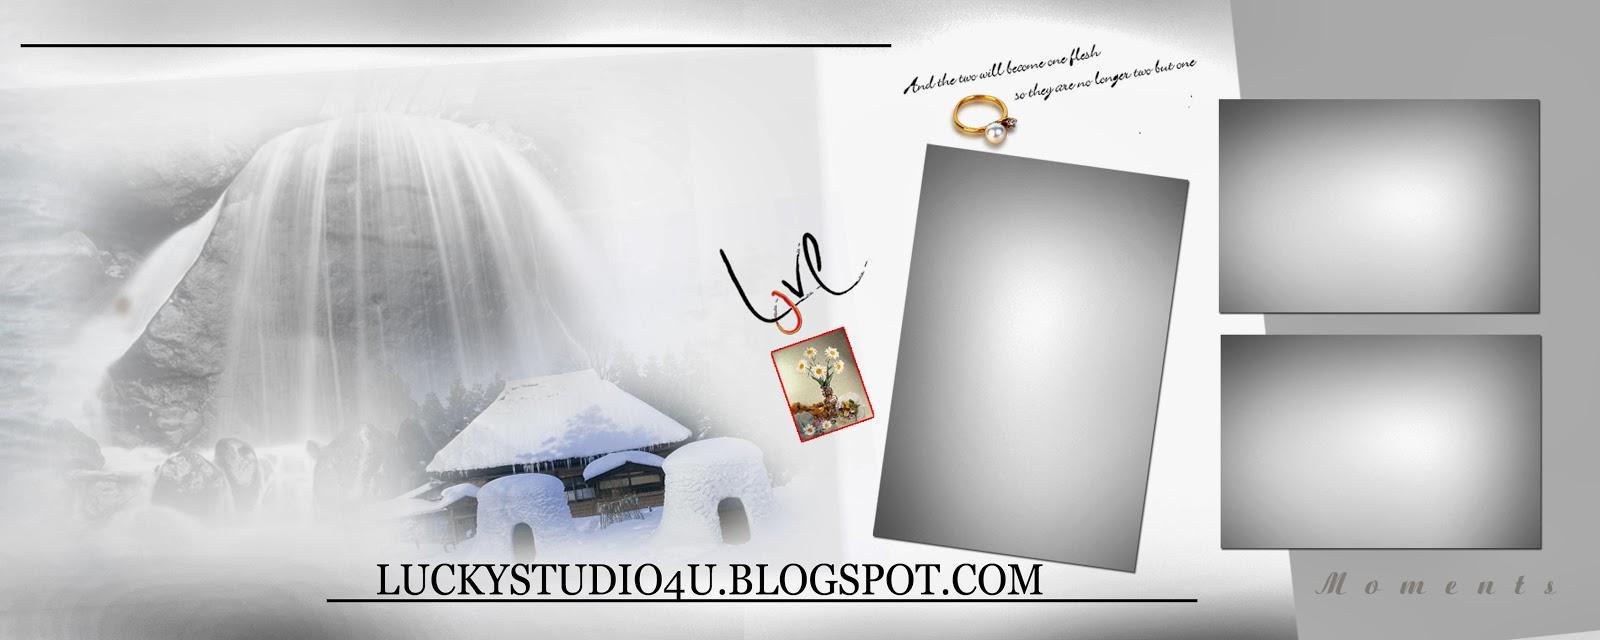 45 wedding album templates free download luckystudio4u 45 wedding album templates free download pronofoot35fo Images